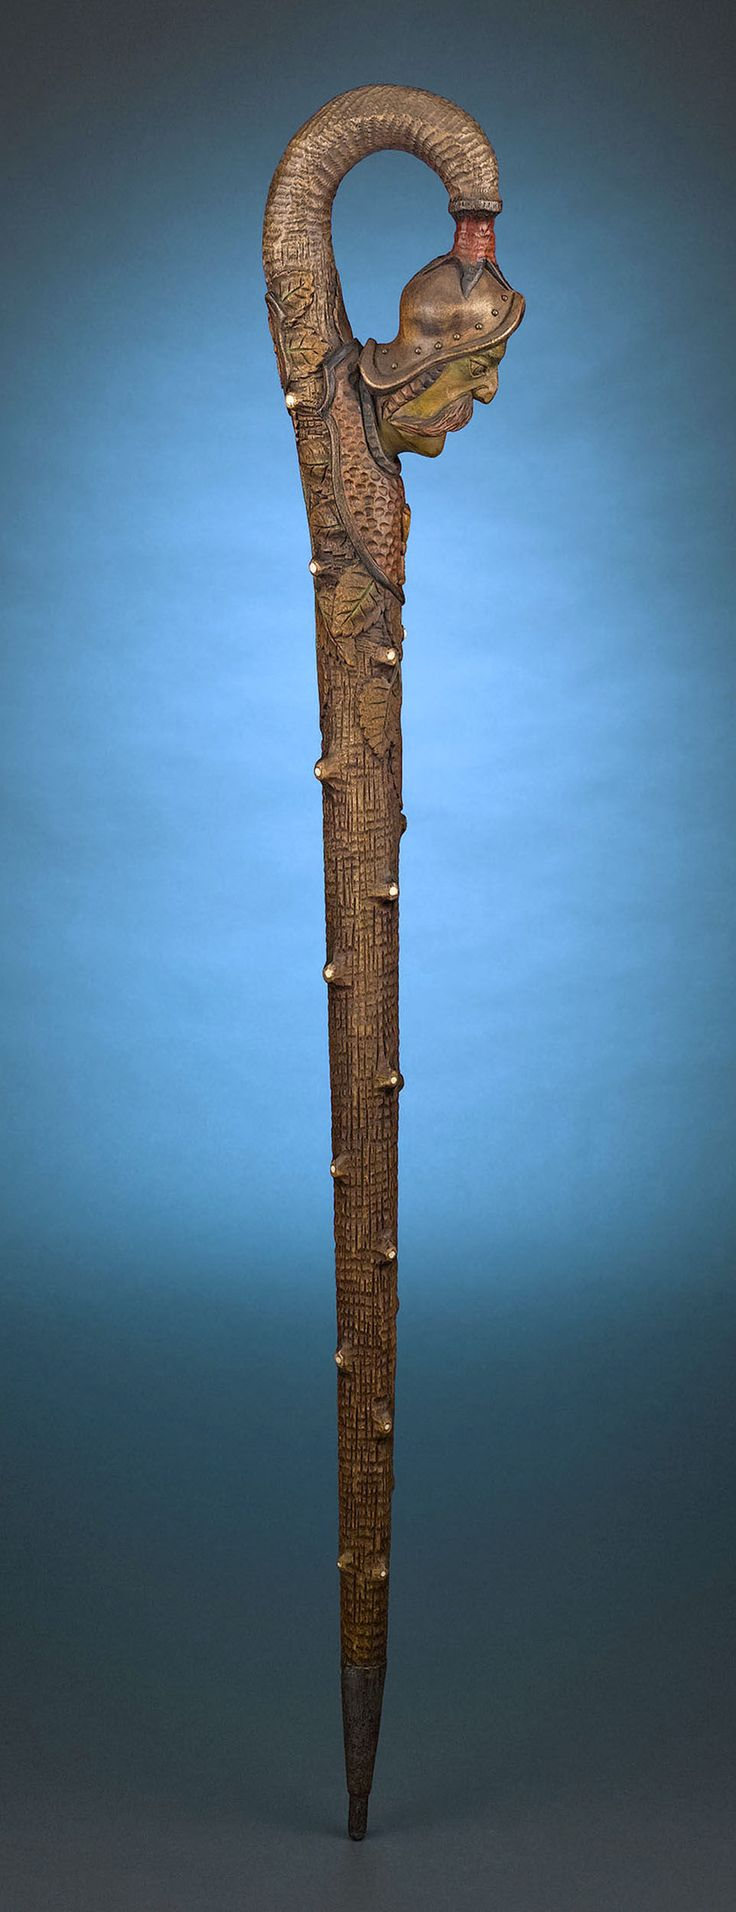 Antique Walking Sticks, Folk Art, Jan Zizka Folk Art Cane ~ M.S. Rau Antiques